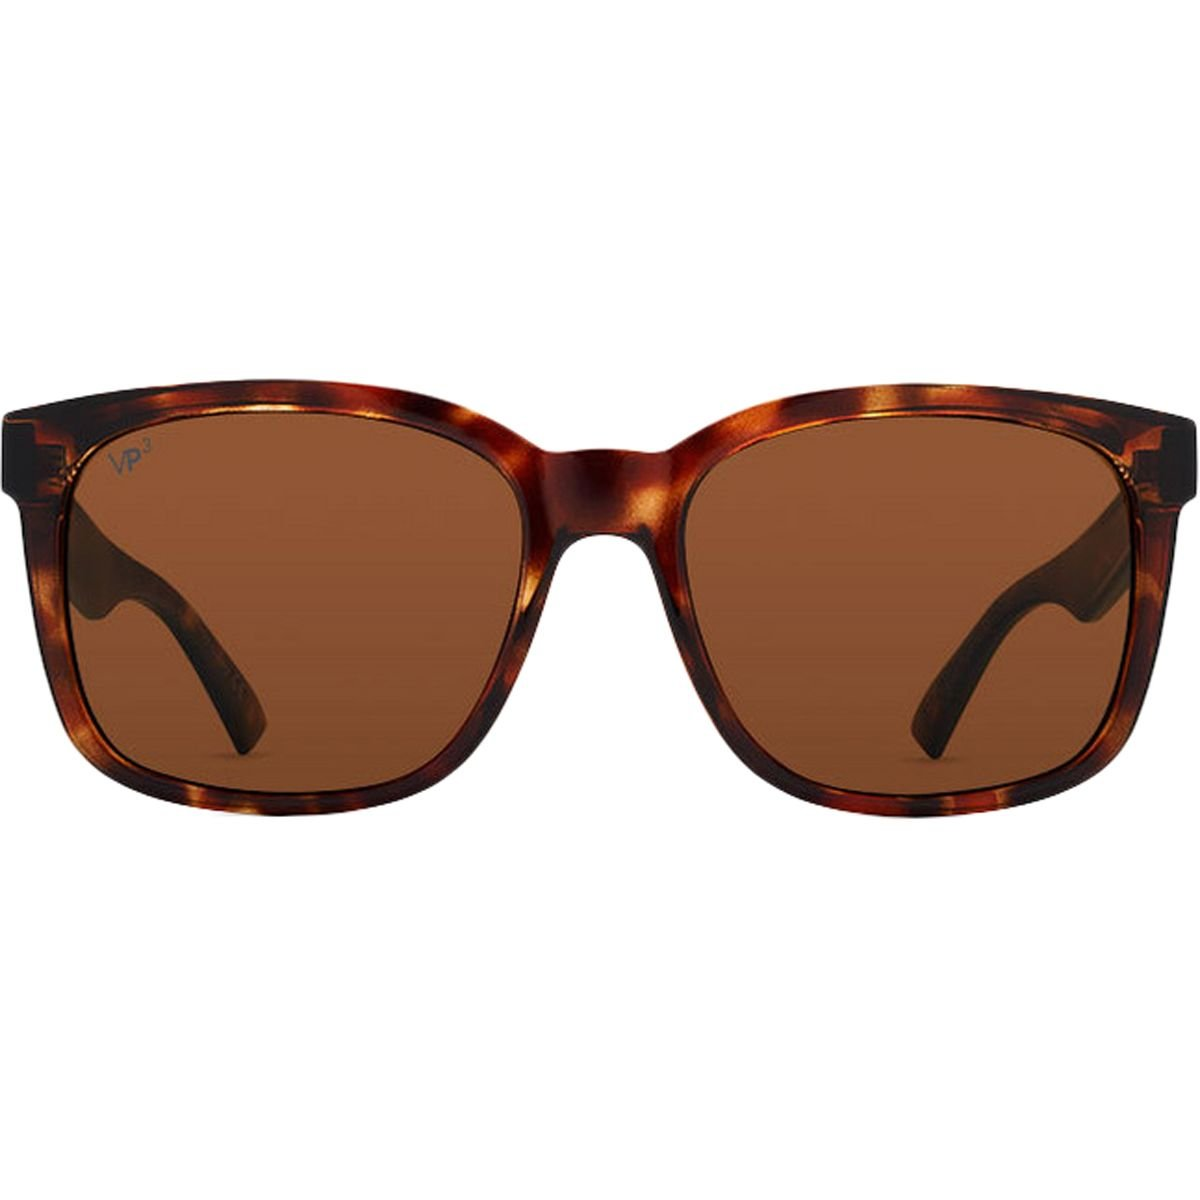 Tabacco Tortoise w//Wildlife Bronze Lens VonZipper Mens Howl Polarized Sunglasses